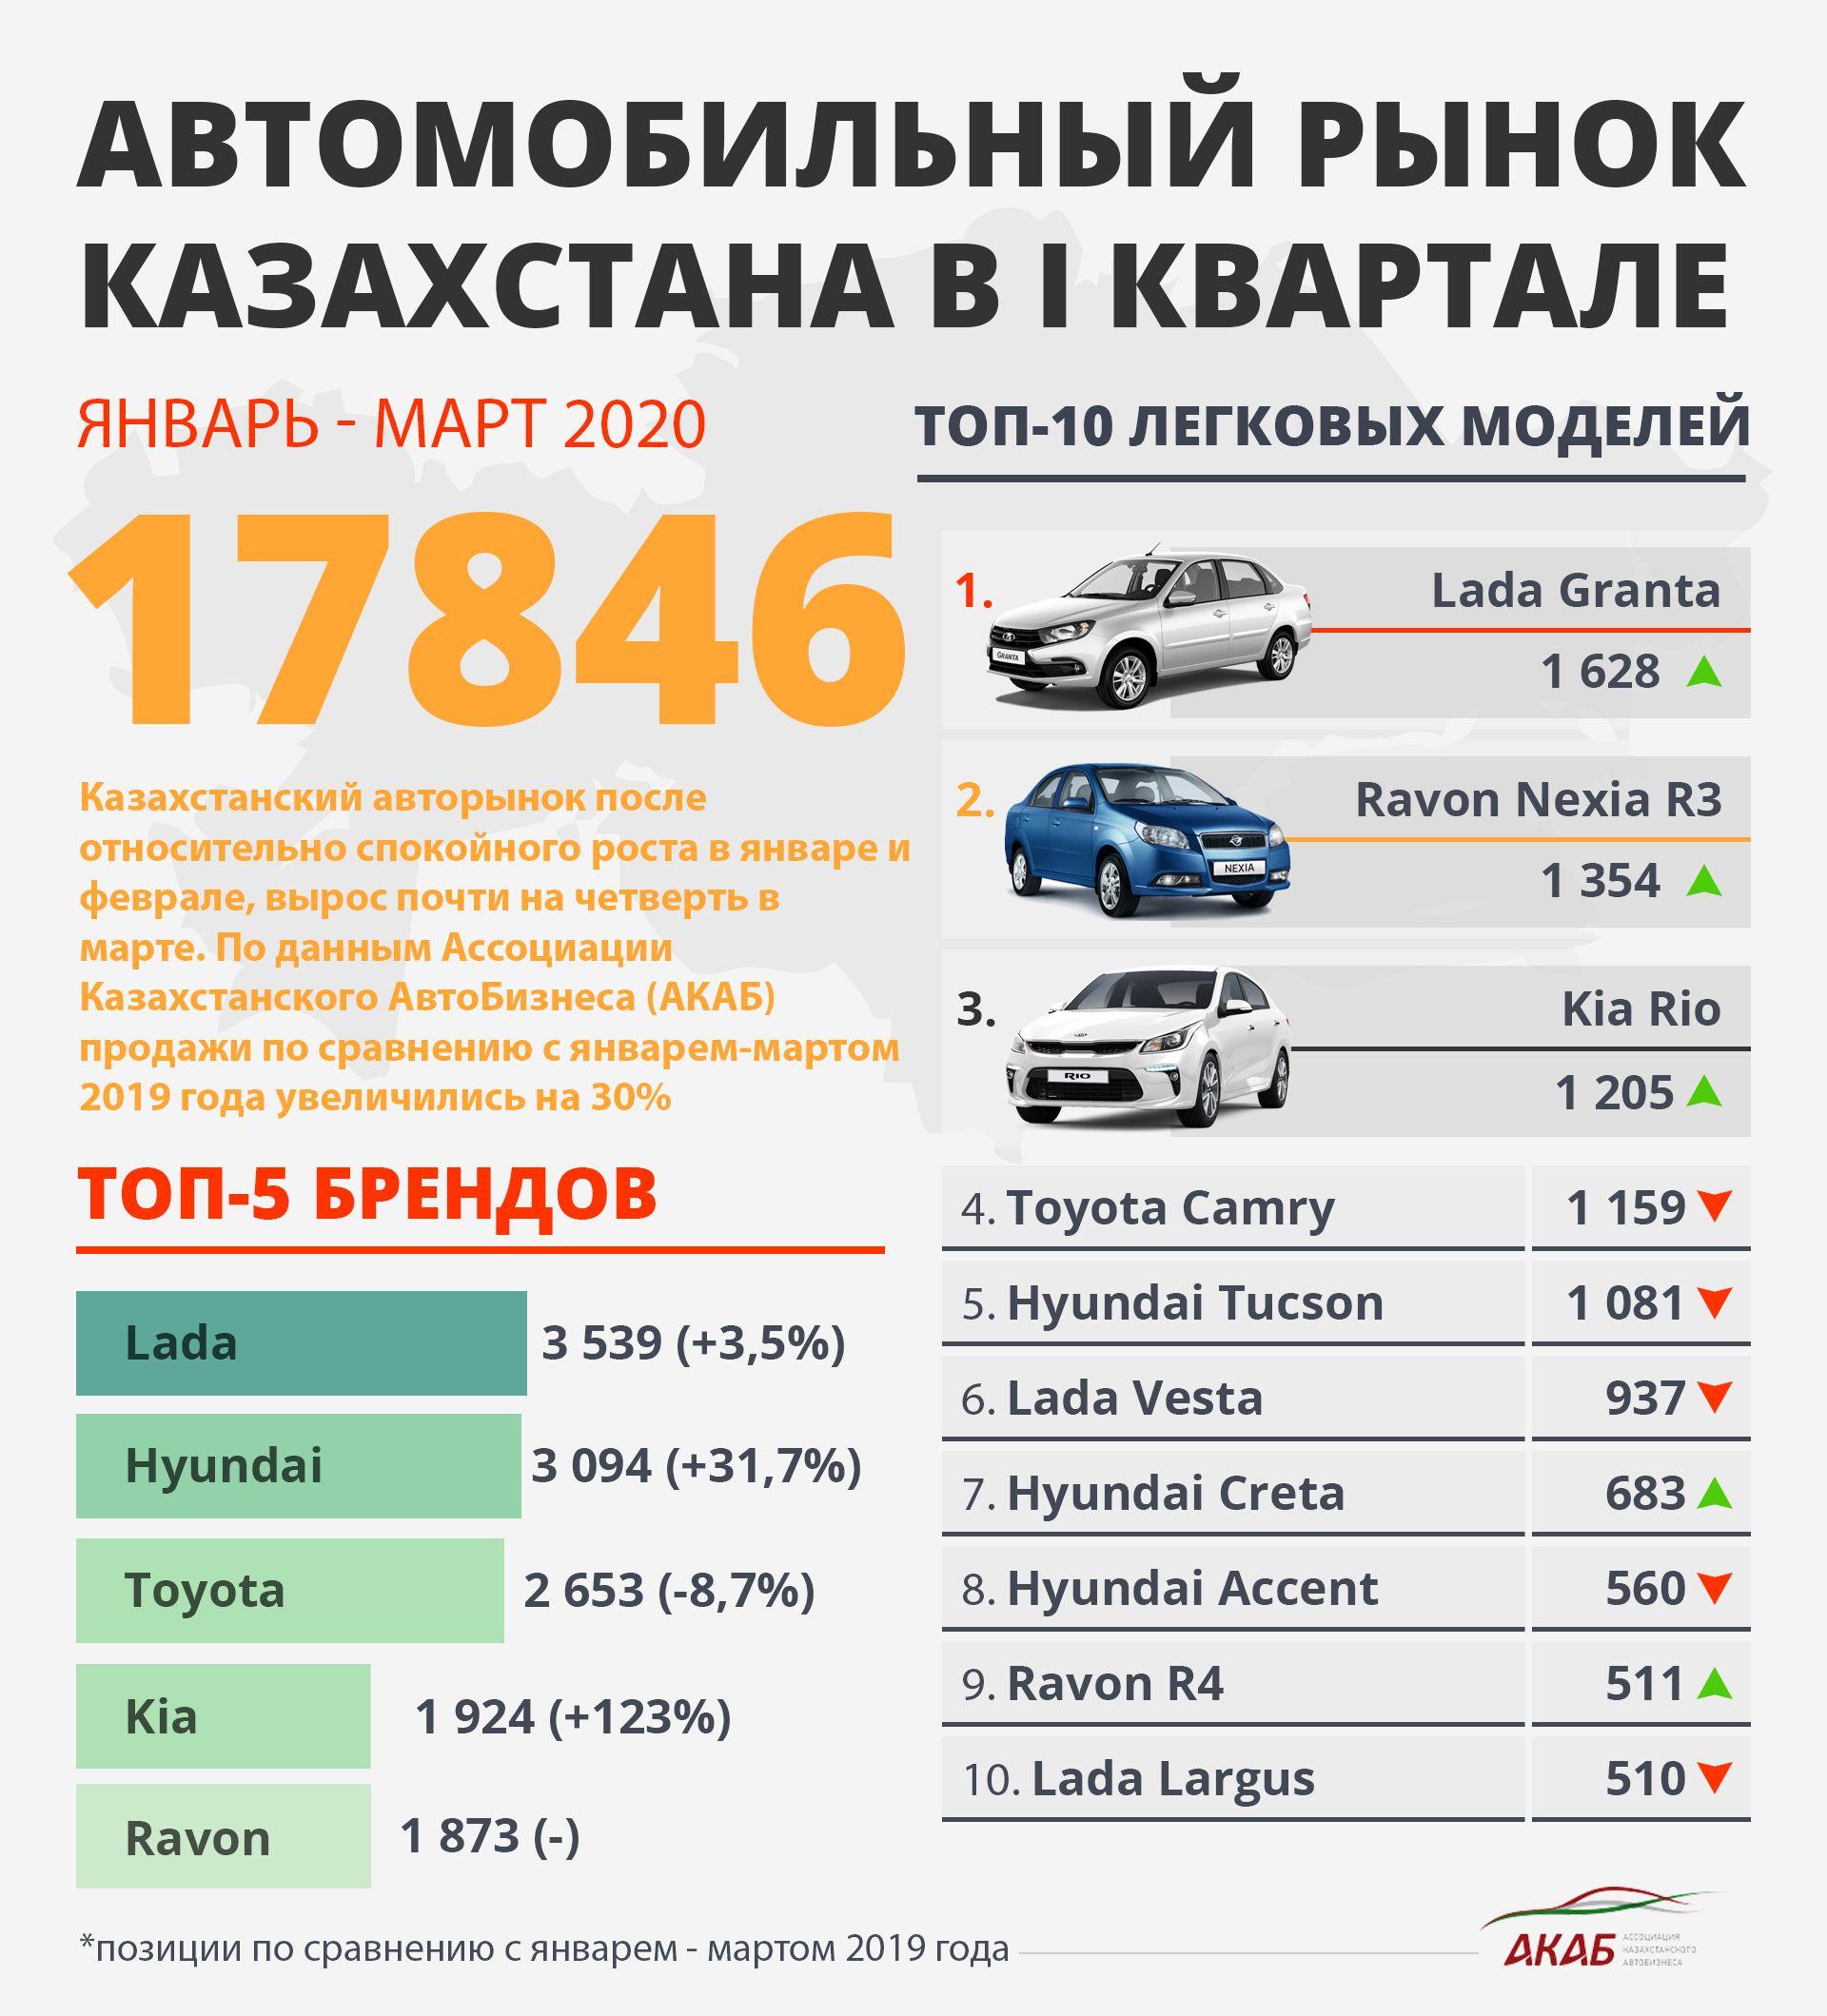 Итоги продаж в РК, юбилеи Veyron, RAV4 и Jimny 278484 - Kapital.kz